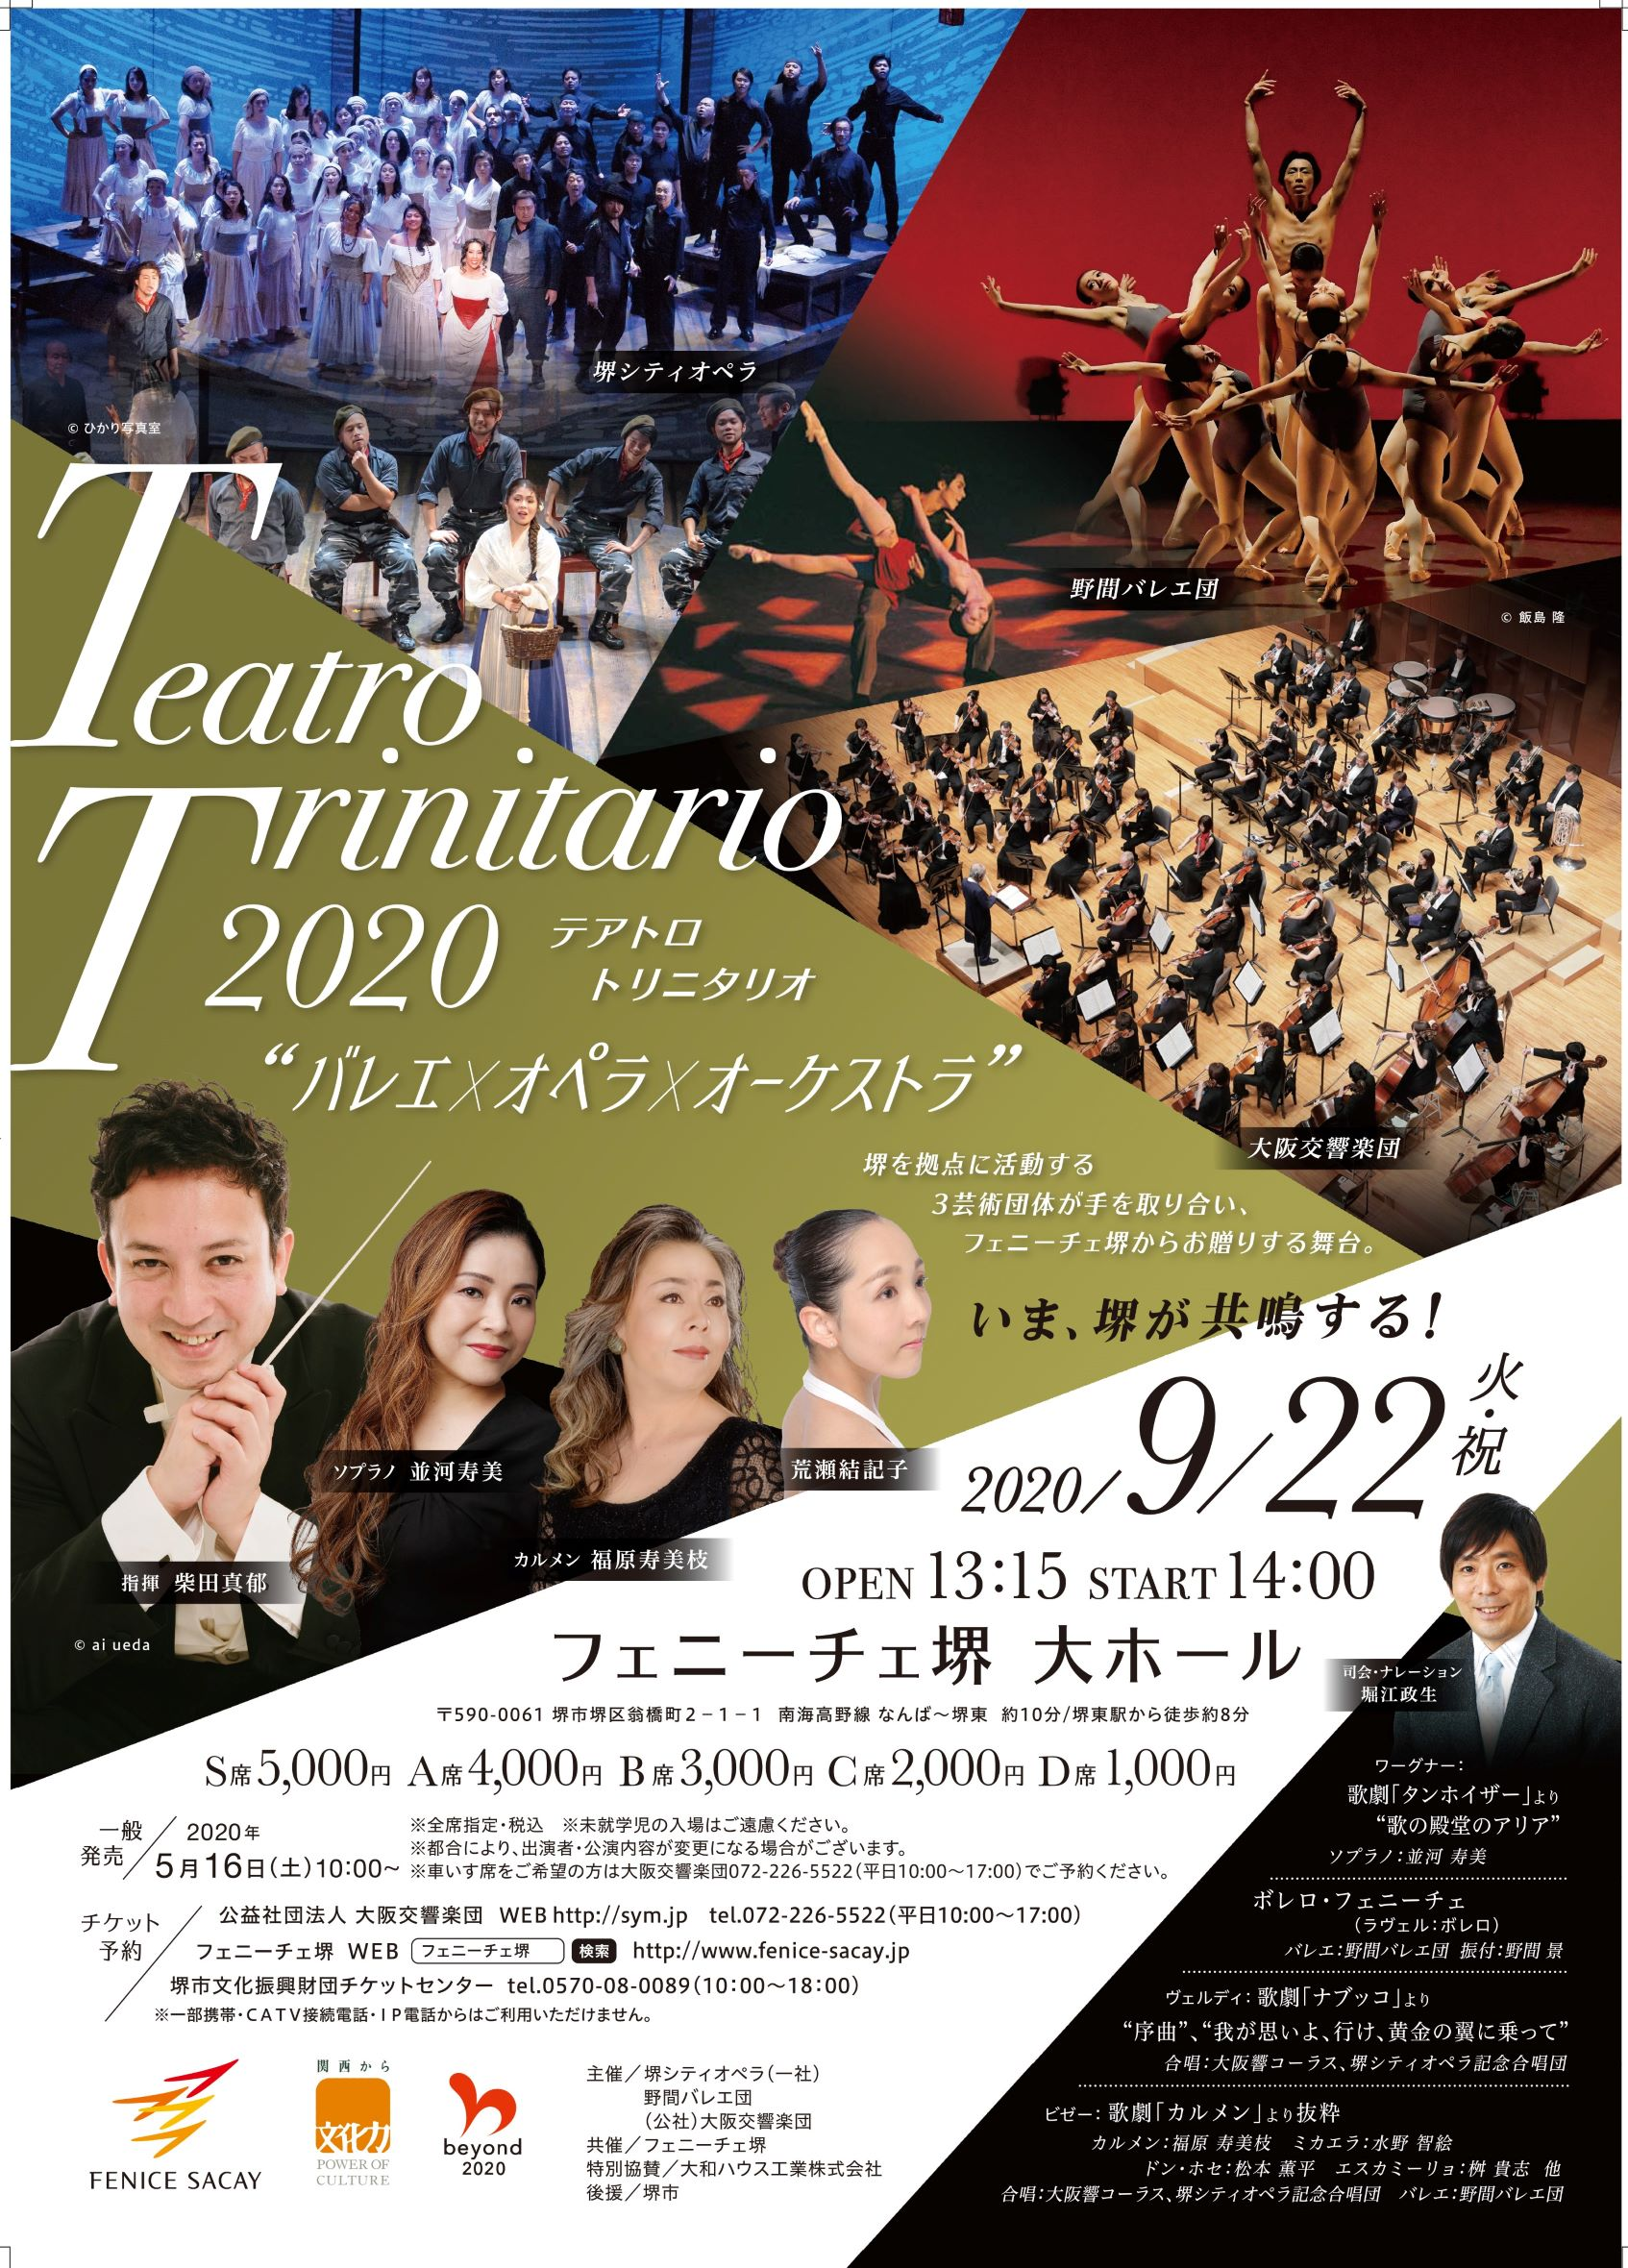 "Teatro Trinitario 2020 ""バレエ×オペラ×オーケストラ"""